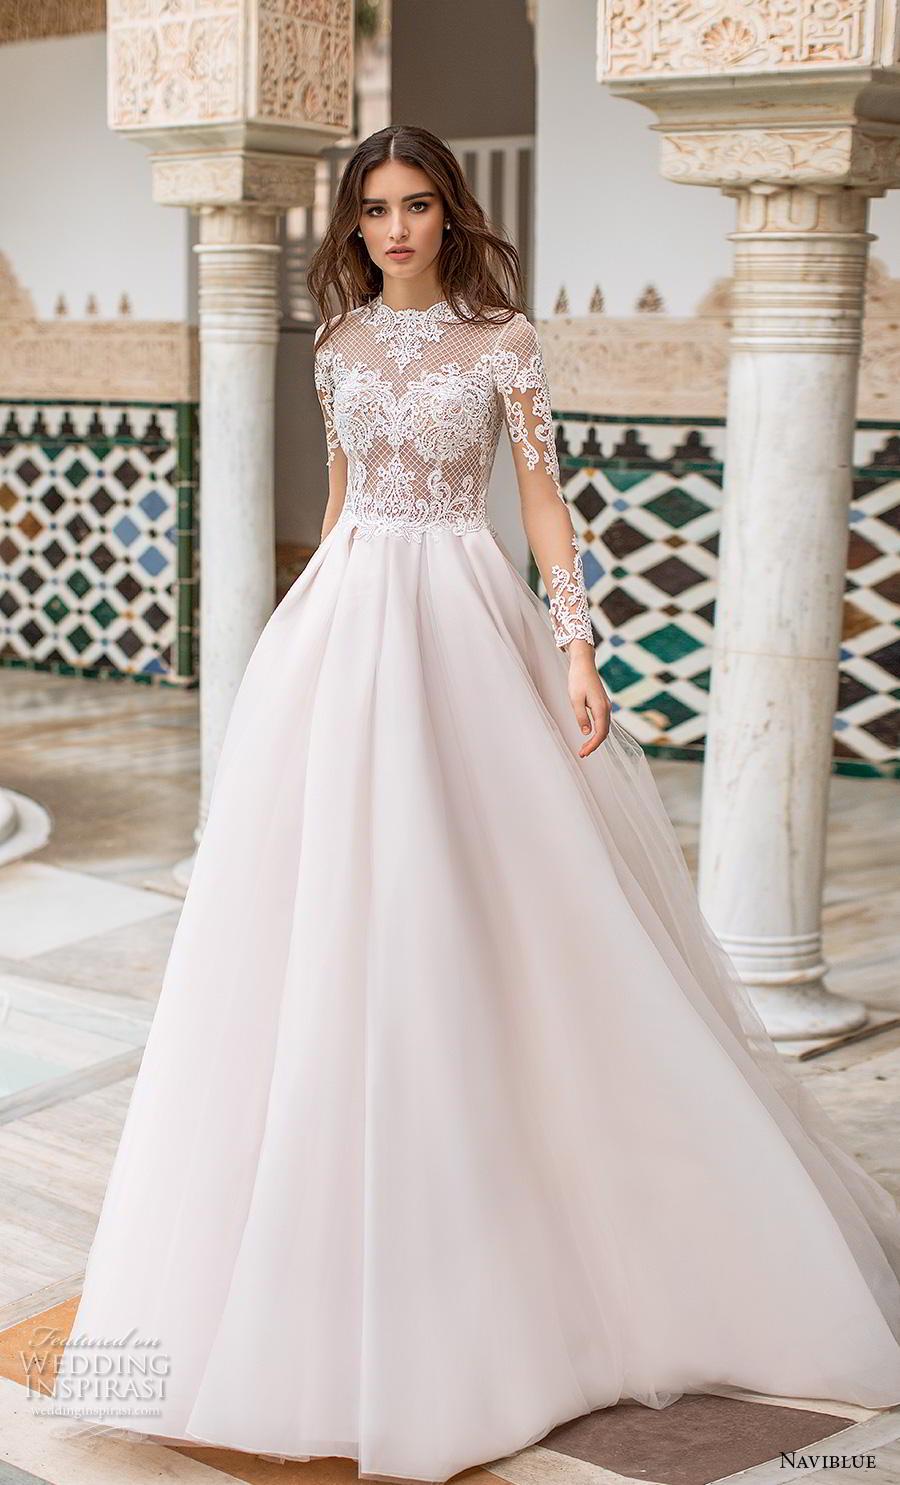 naviblue 2019 bridal long sleeves jewel neck heavily embellished bodice elegant a  line wedding dress covered lace back chapel train (9) mv